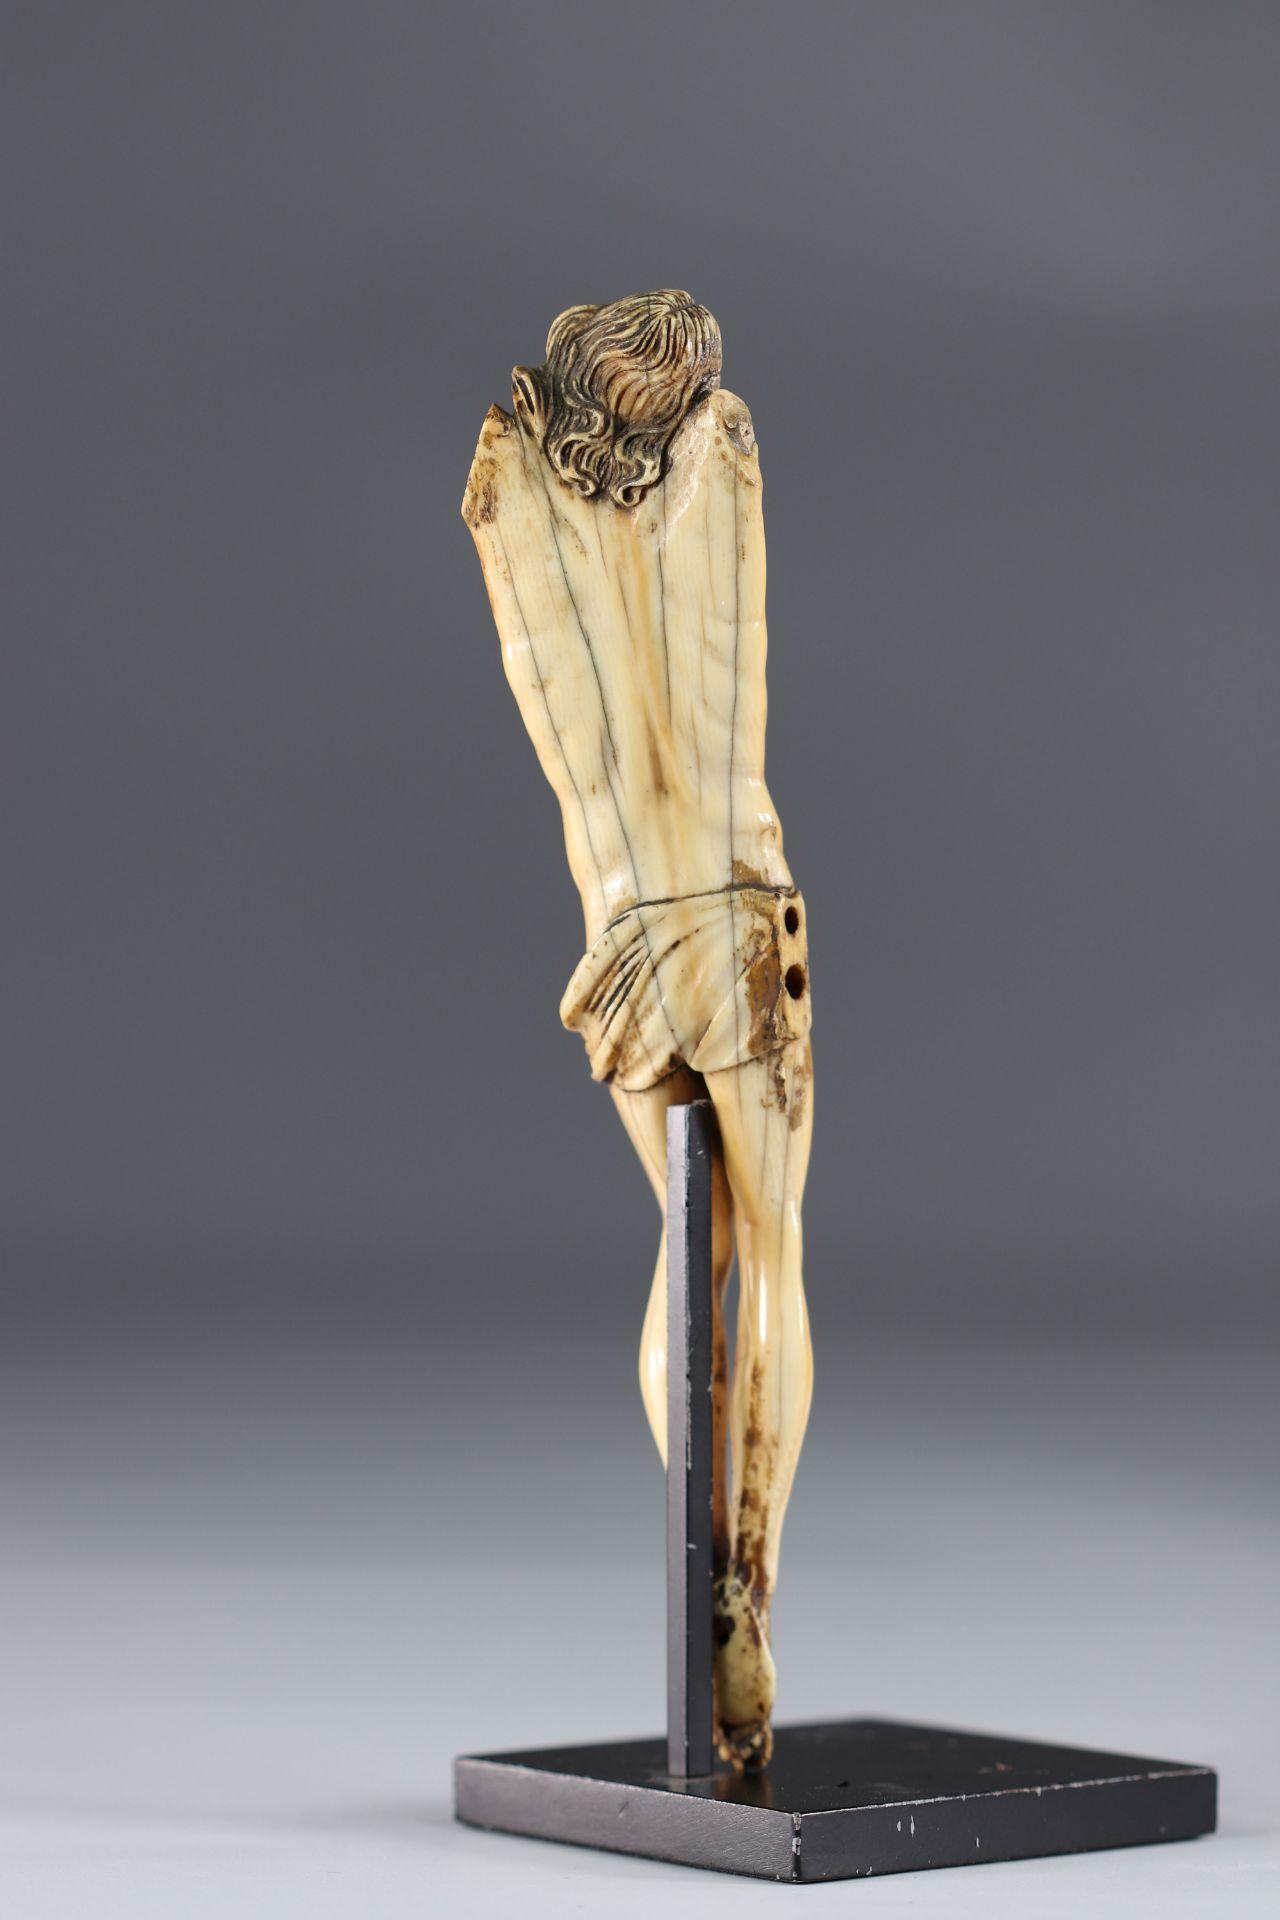 Corpus Christi - Ivory - arm missing - Image 3 of 3